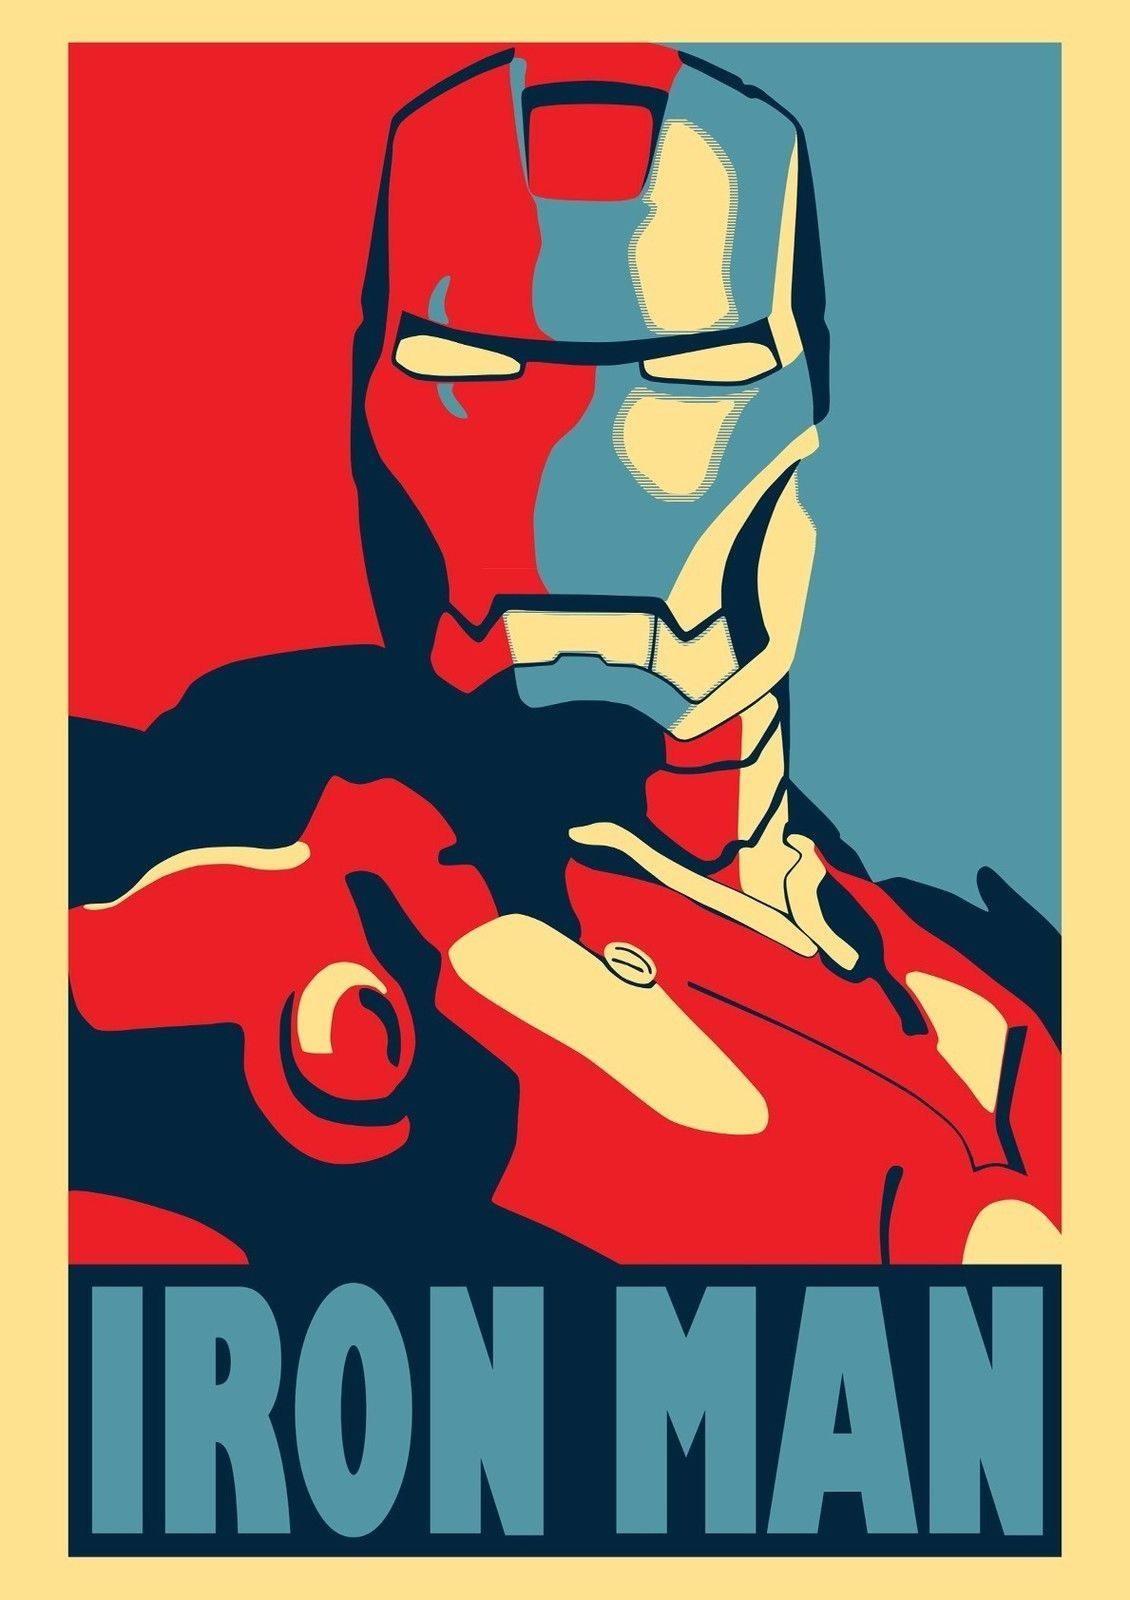 64657 Iron Man Wall Poster Print Affiche